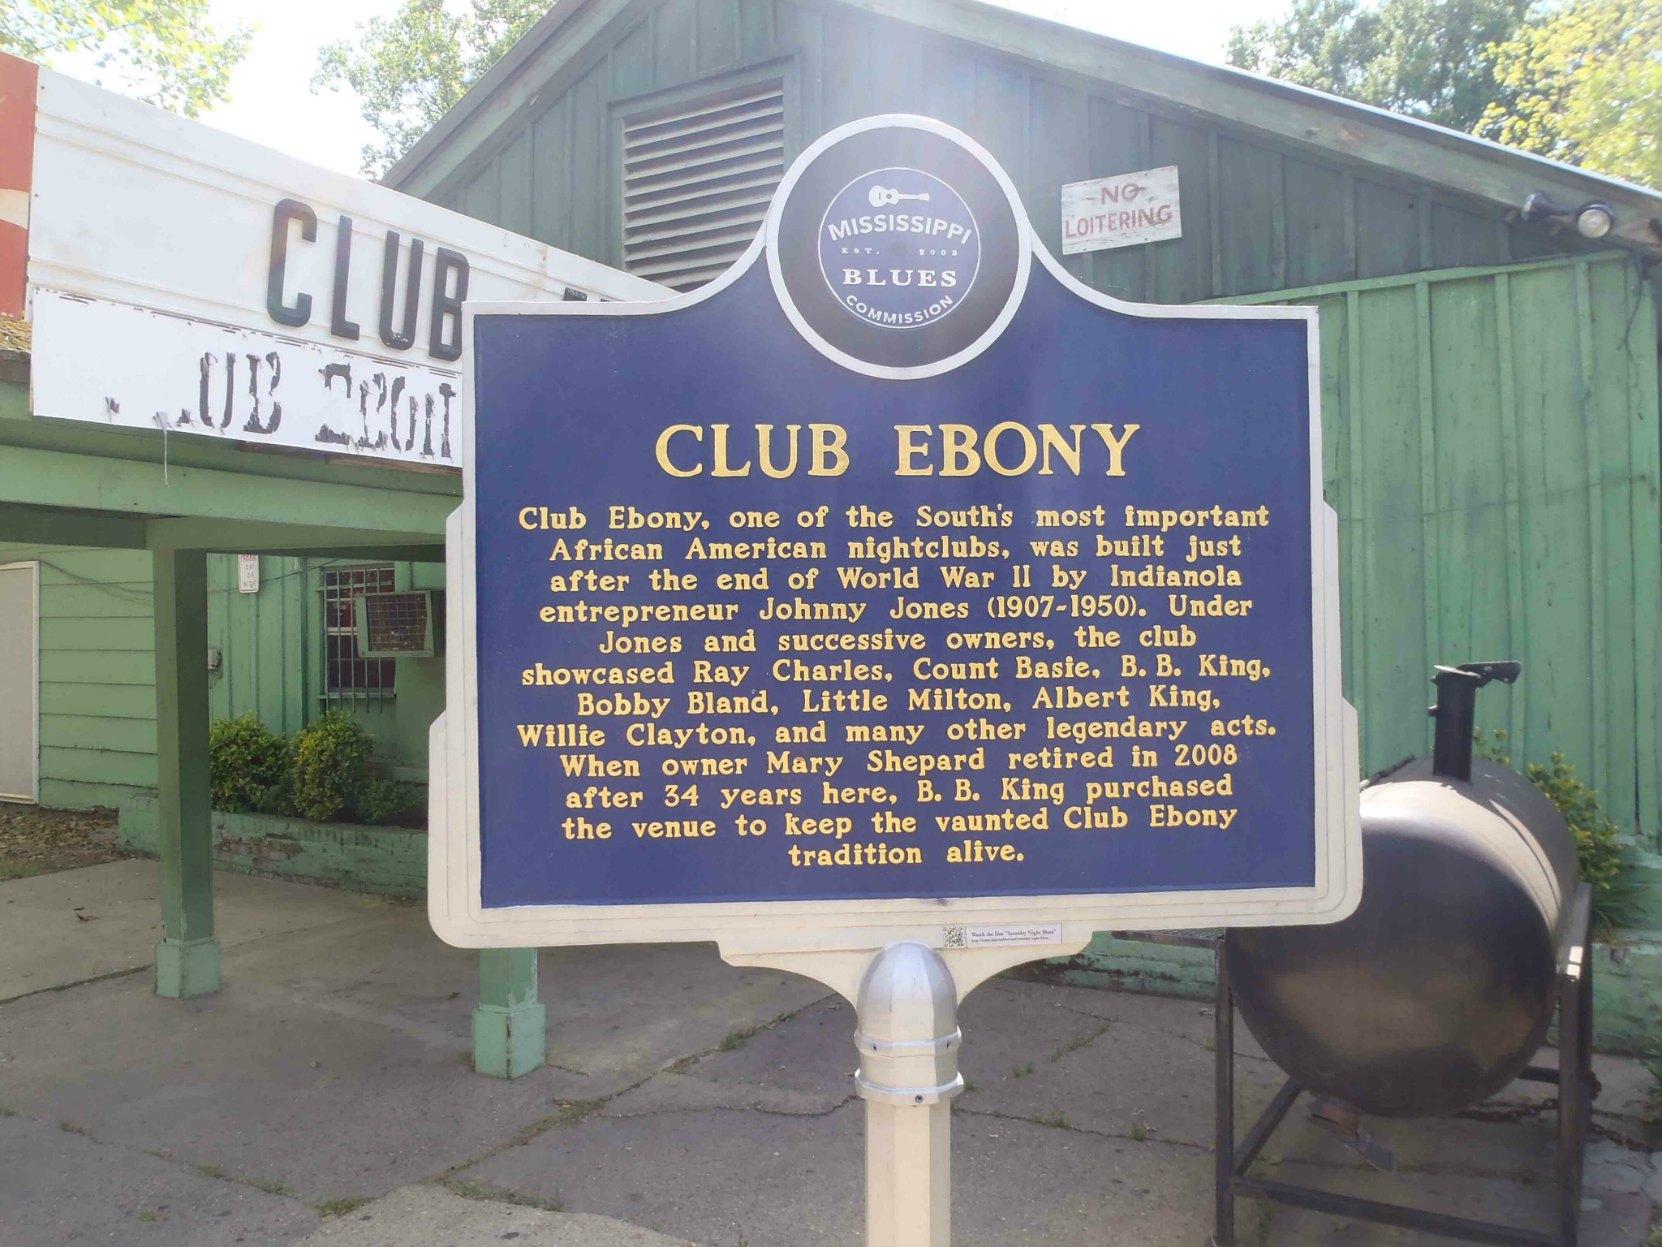 Mississippi Blues Trail marker at Club Ebony, Indianola, Mississippi